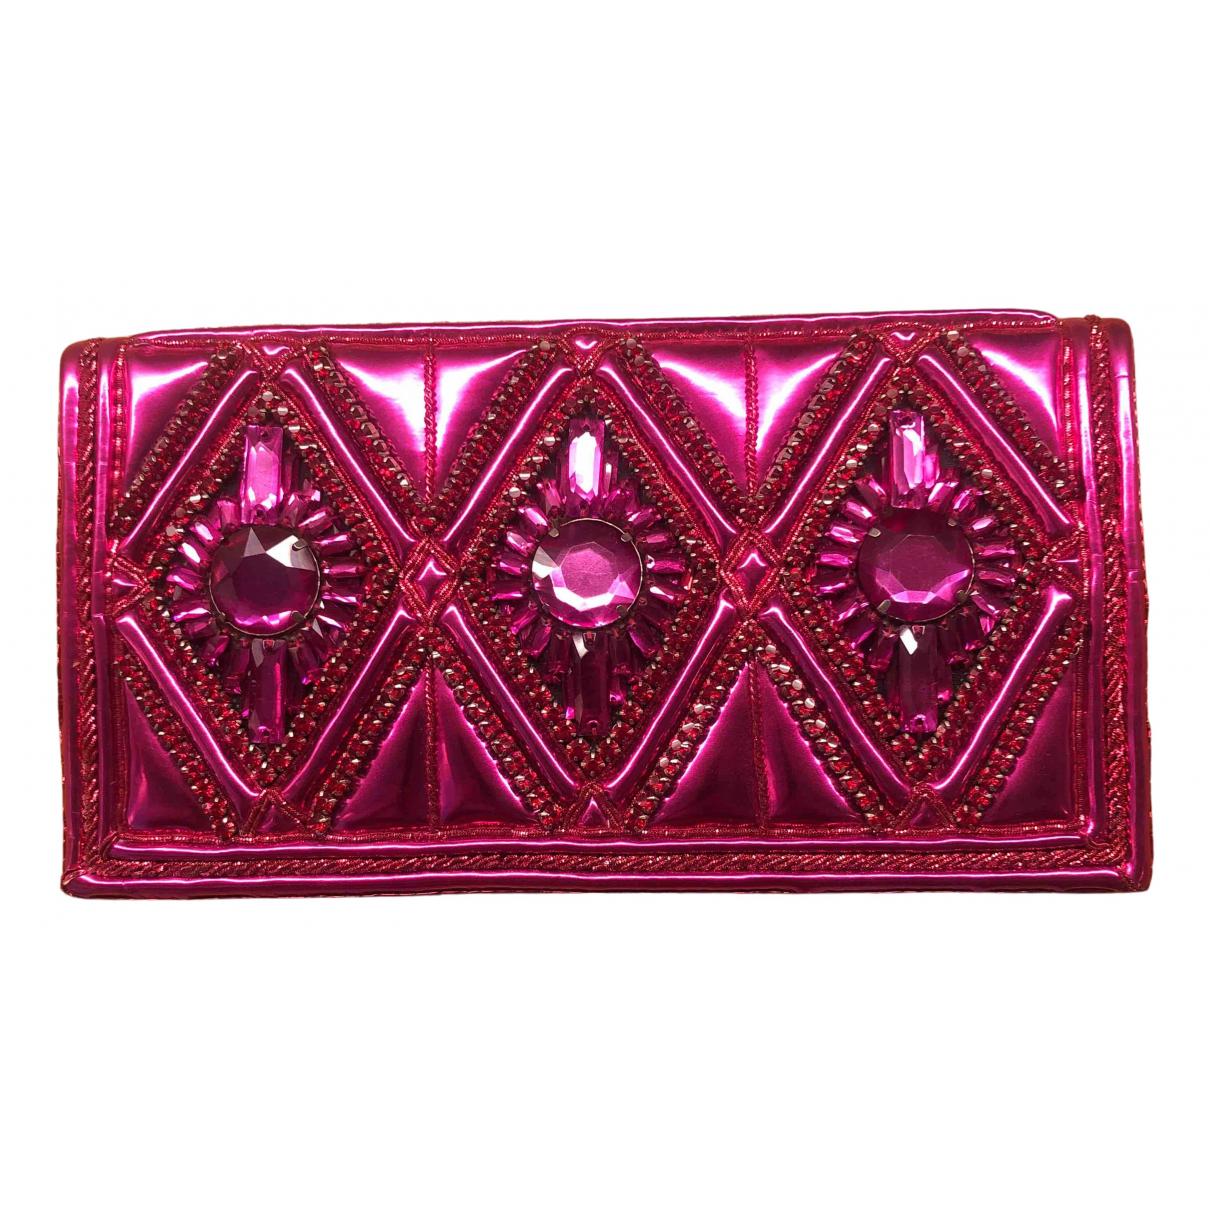 Balmain \N Pink Leather Clutch bag for Women \N